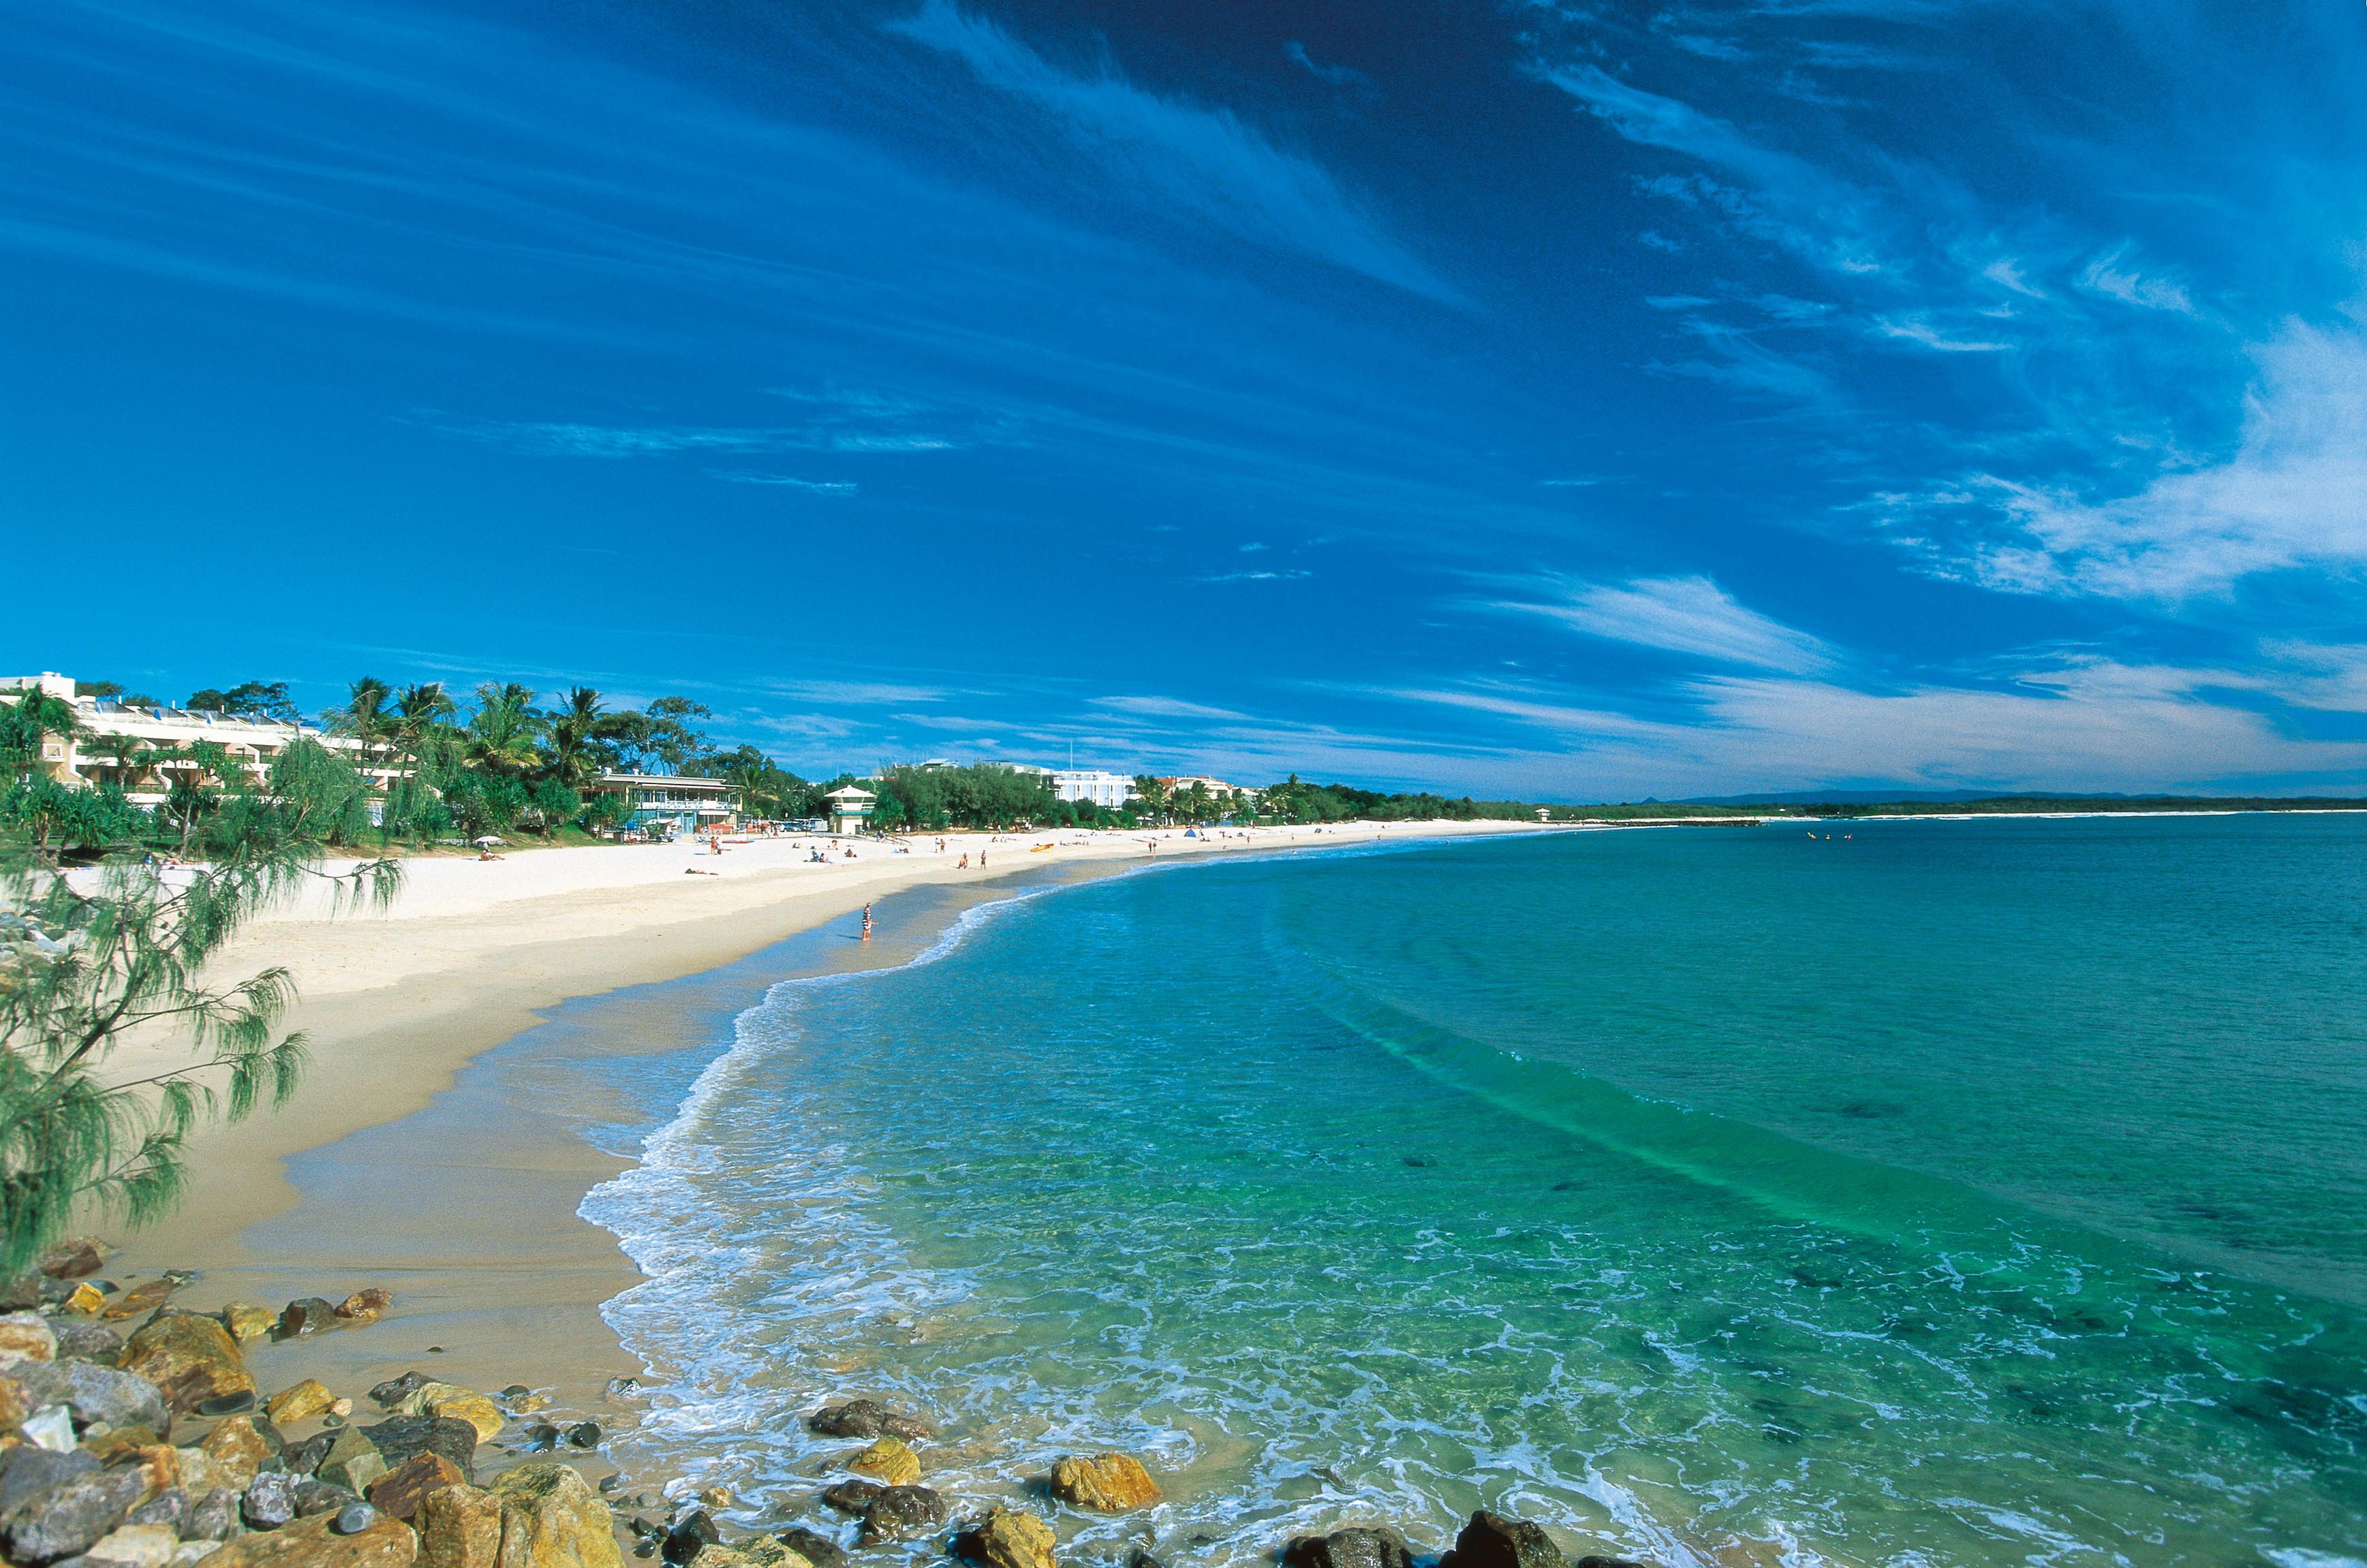 https://assets.boxdice.com.au/laguna/attachments/c78/702/tourism_noosa_noosa_main_beach.jpg?d5f7bd6682ef881e7a26718a3a03a8ac